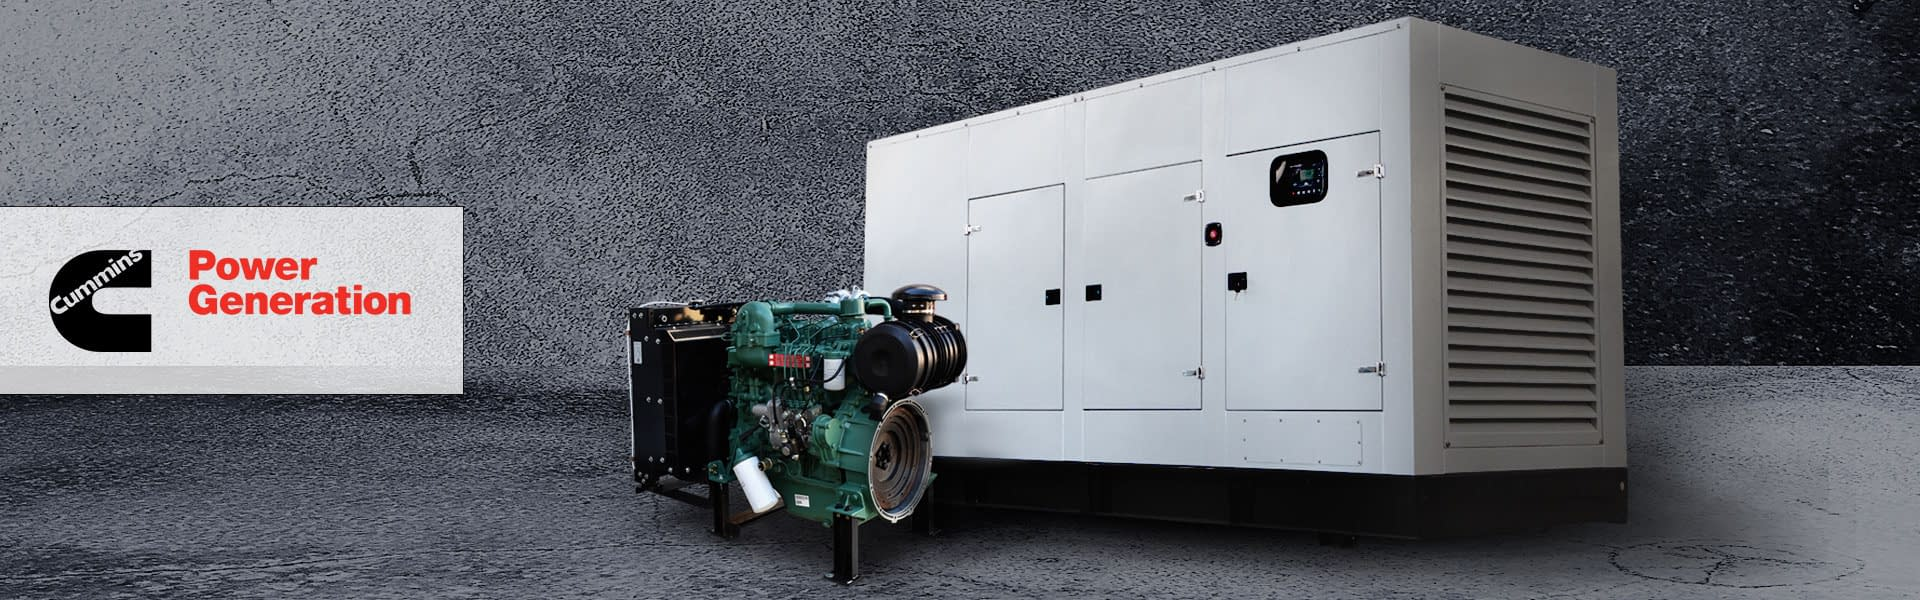 Cummins Diesel Generator for Sale | Cummins Generator South Africa | Generator King